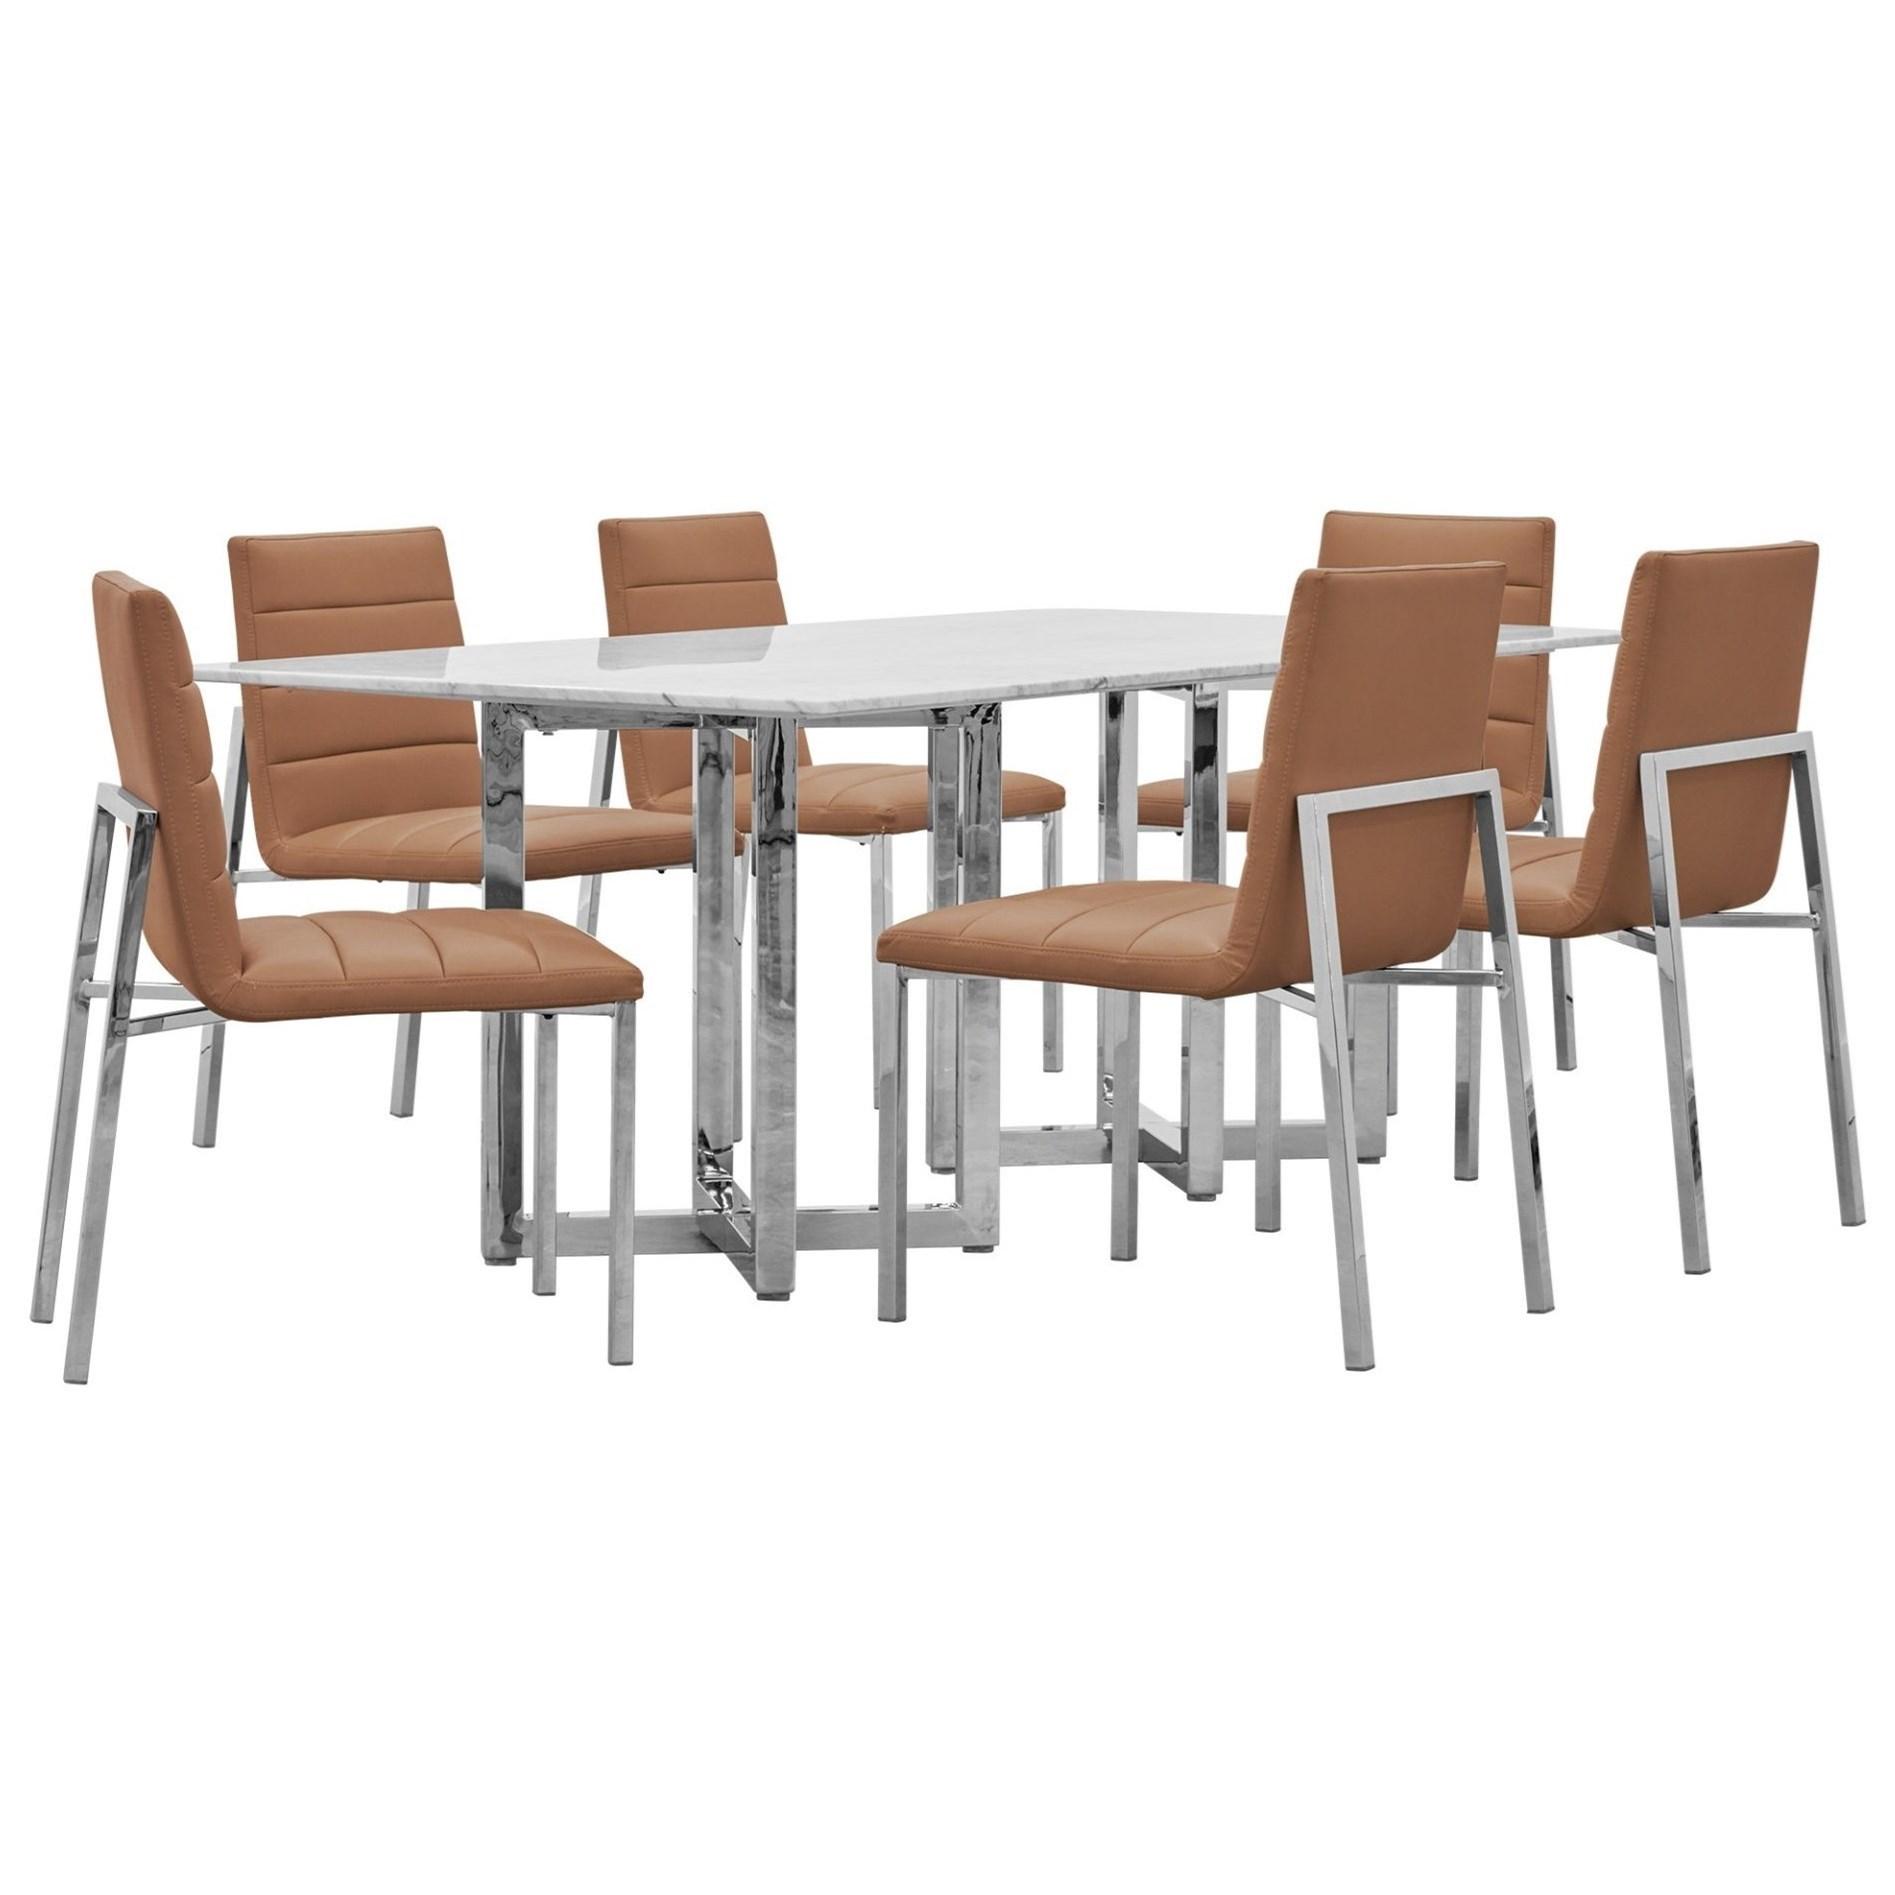 Amalfi 7-Piece Table Set by Modus International at A1 Furniture & Mattress